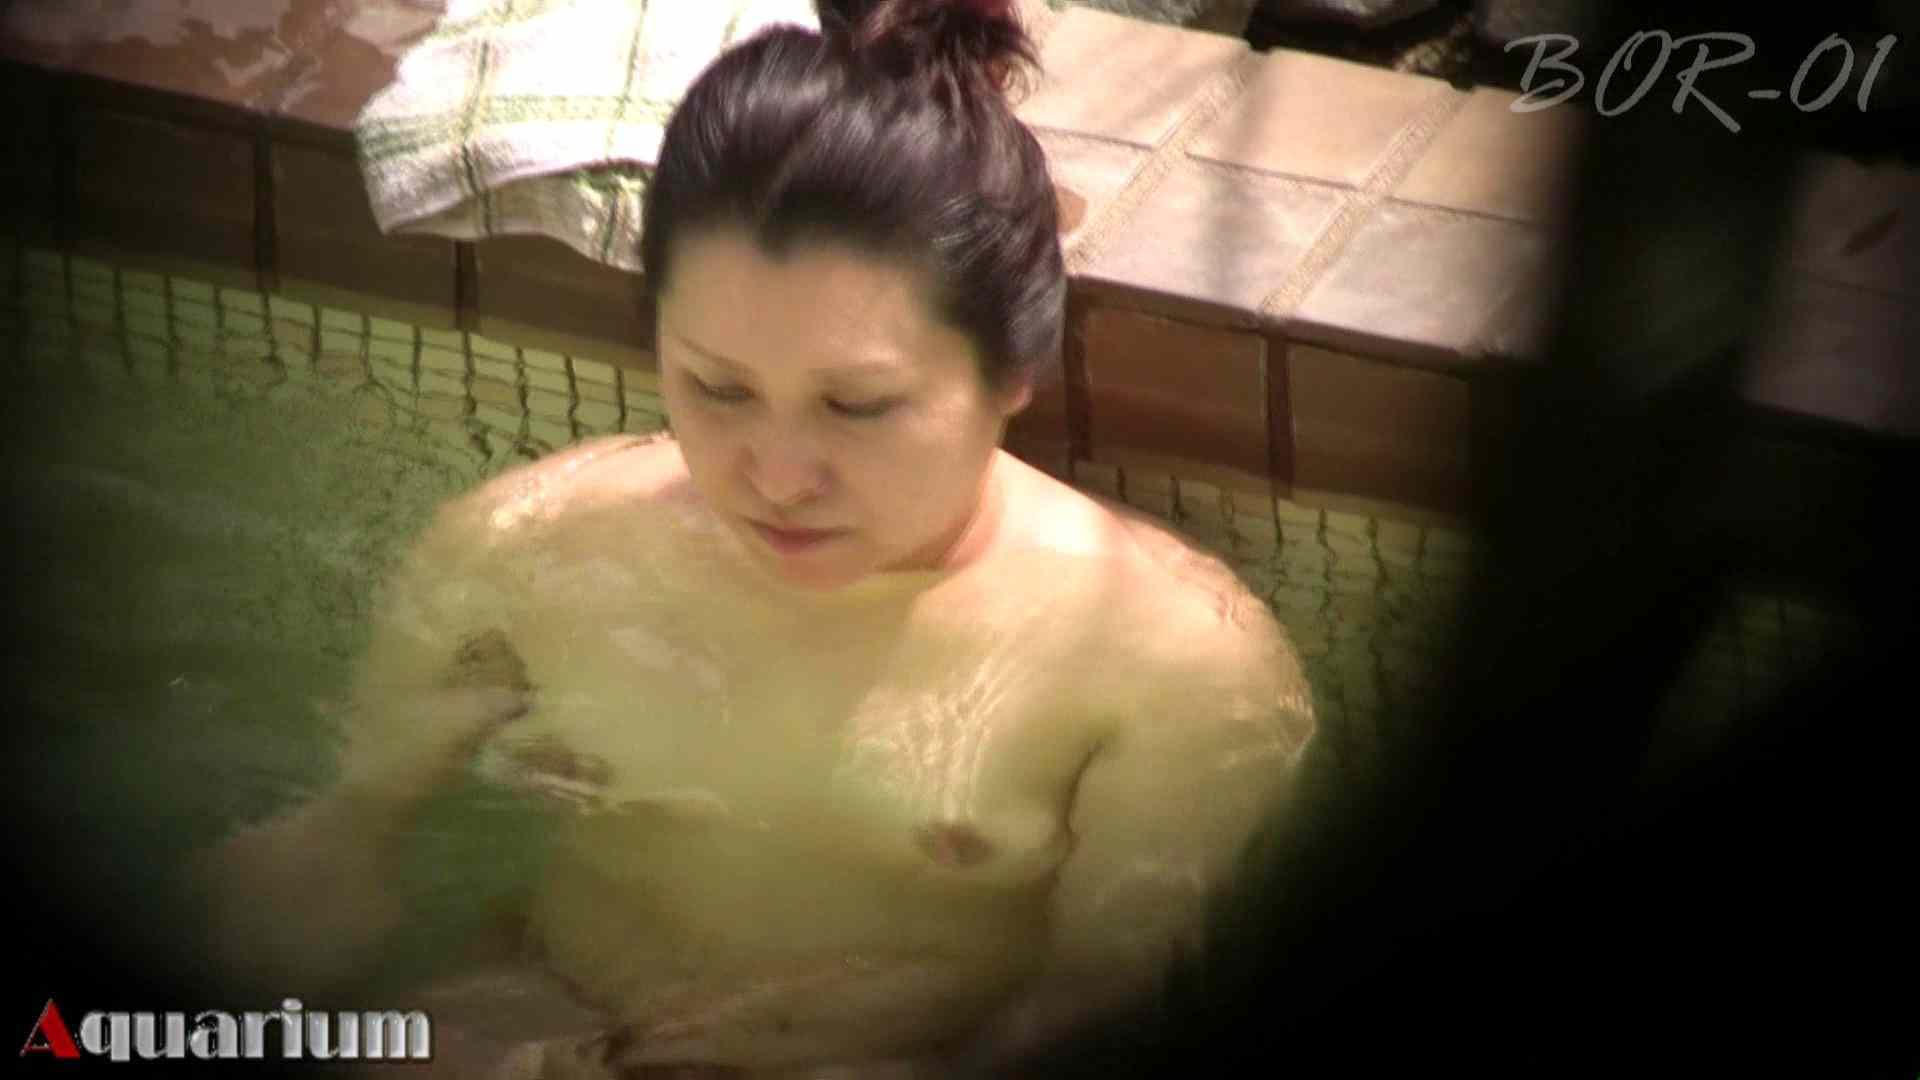 Aquaな露天風呂Vol.458 露天風呂 | OLのエロ生活  29連発 10